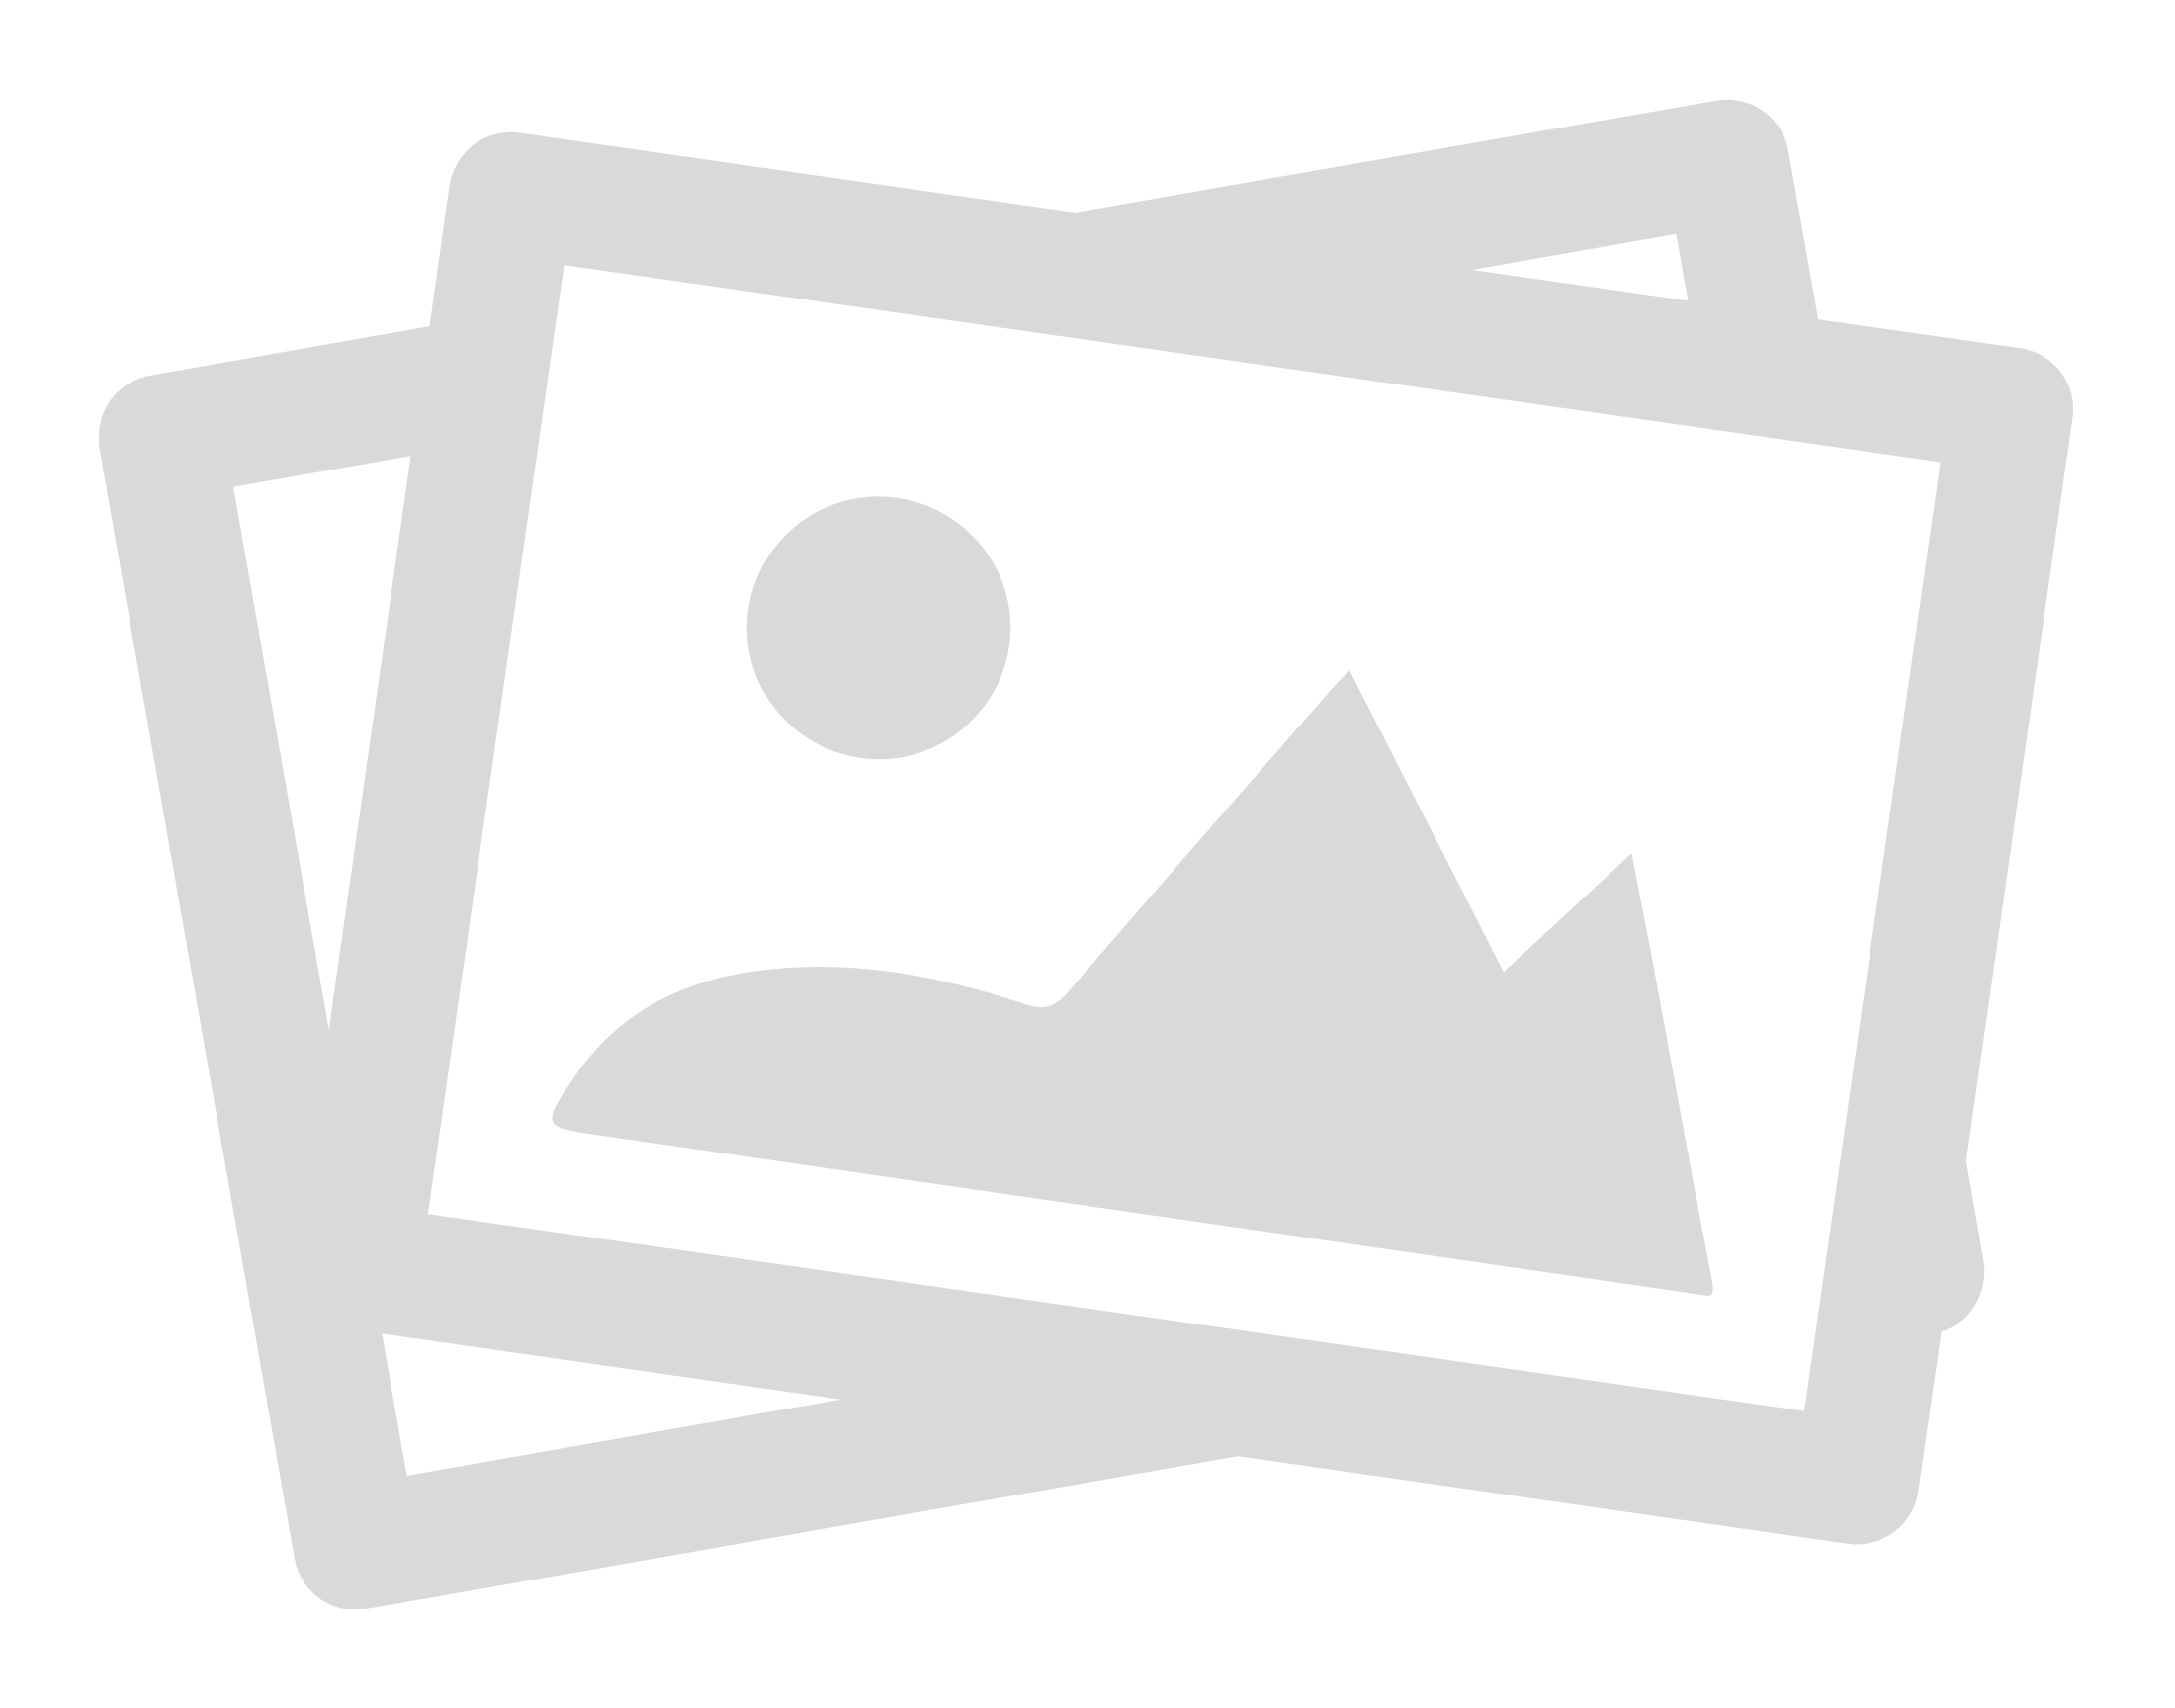 Grønland - Hæftet - af Namminersornerullutik Oqartussat/Grønlands Hjemmestyre, Naatsorsueqqissaartarfik/Grønlands Statistik